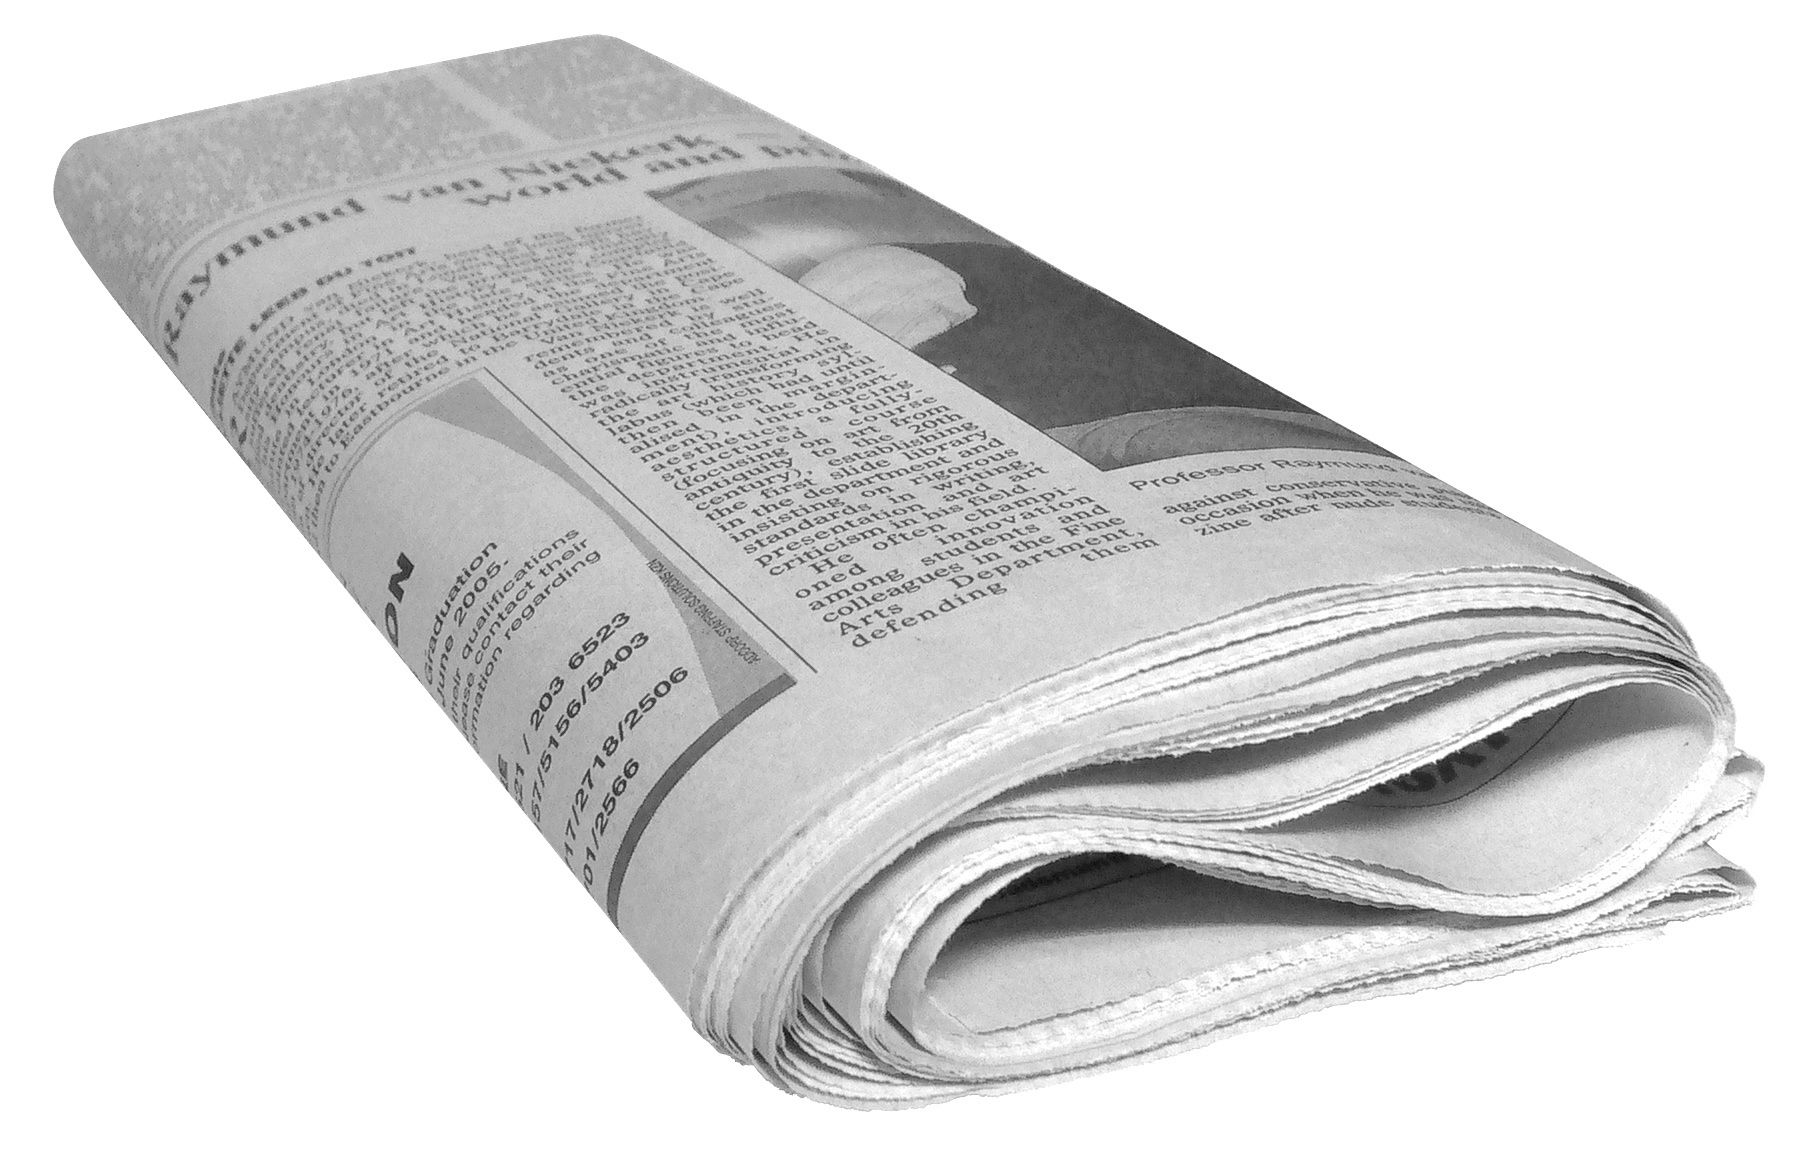 free photo: rolled up newspaper - press, pressrelease, printedmedia